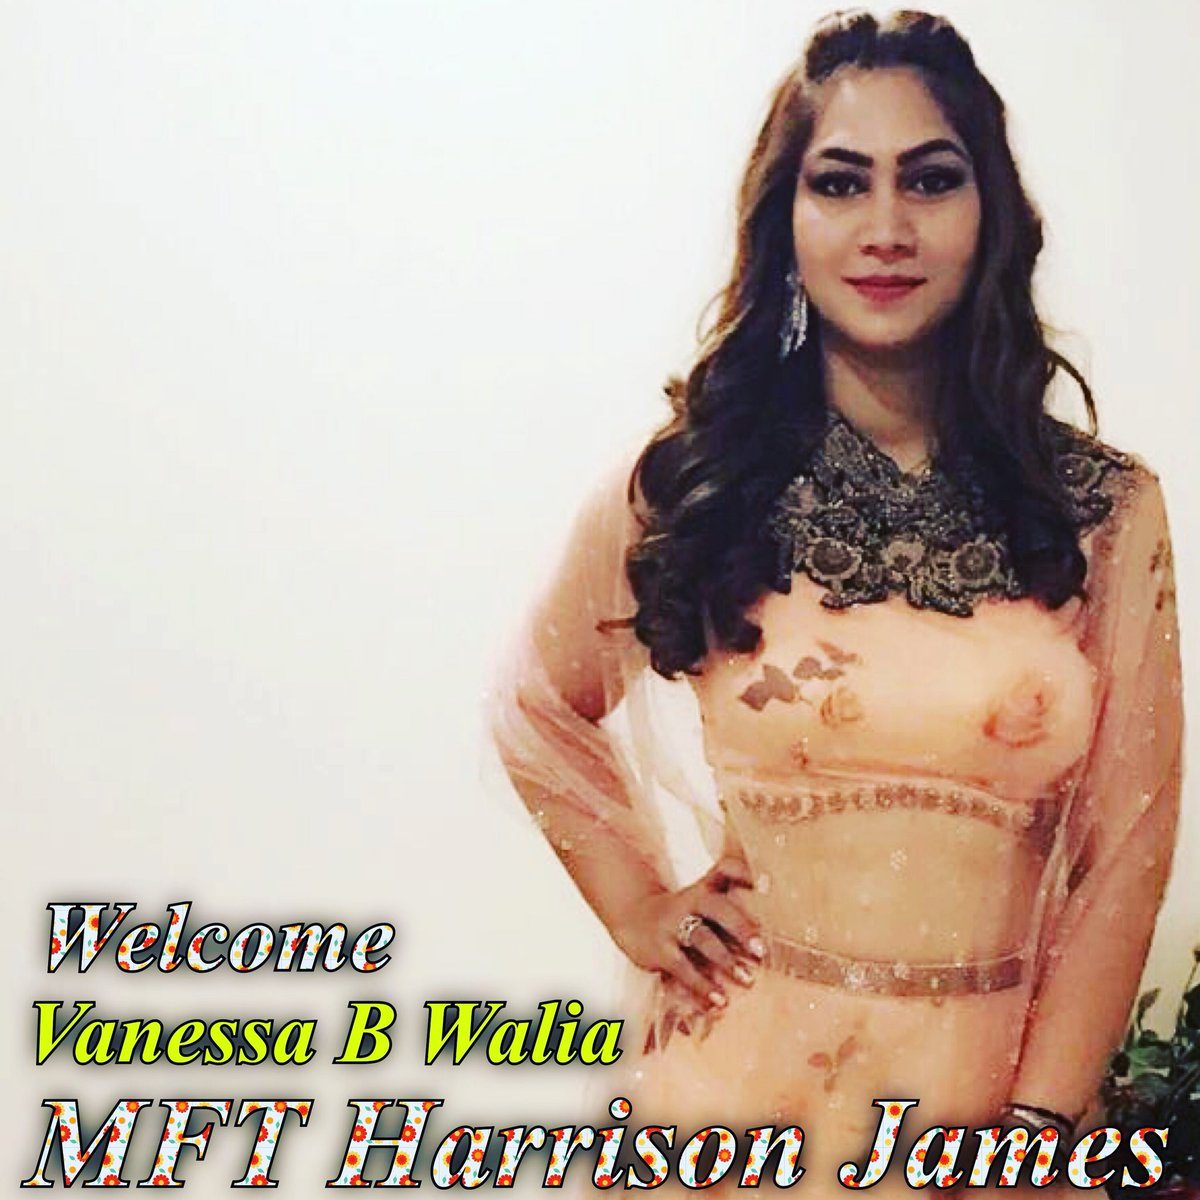 Welcome Vanessa @vanessabwalia at #MFTHarrisonJames 👊 Working on #Her #Transformation #StudTraining Rocks ✌️ https://t.co/tyfJre1Rok